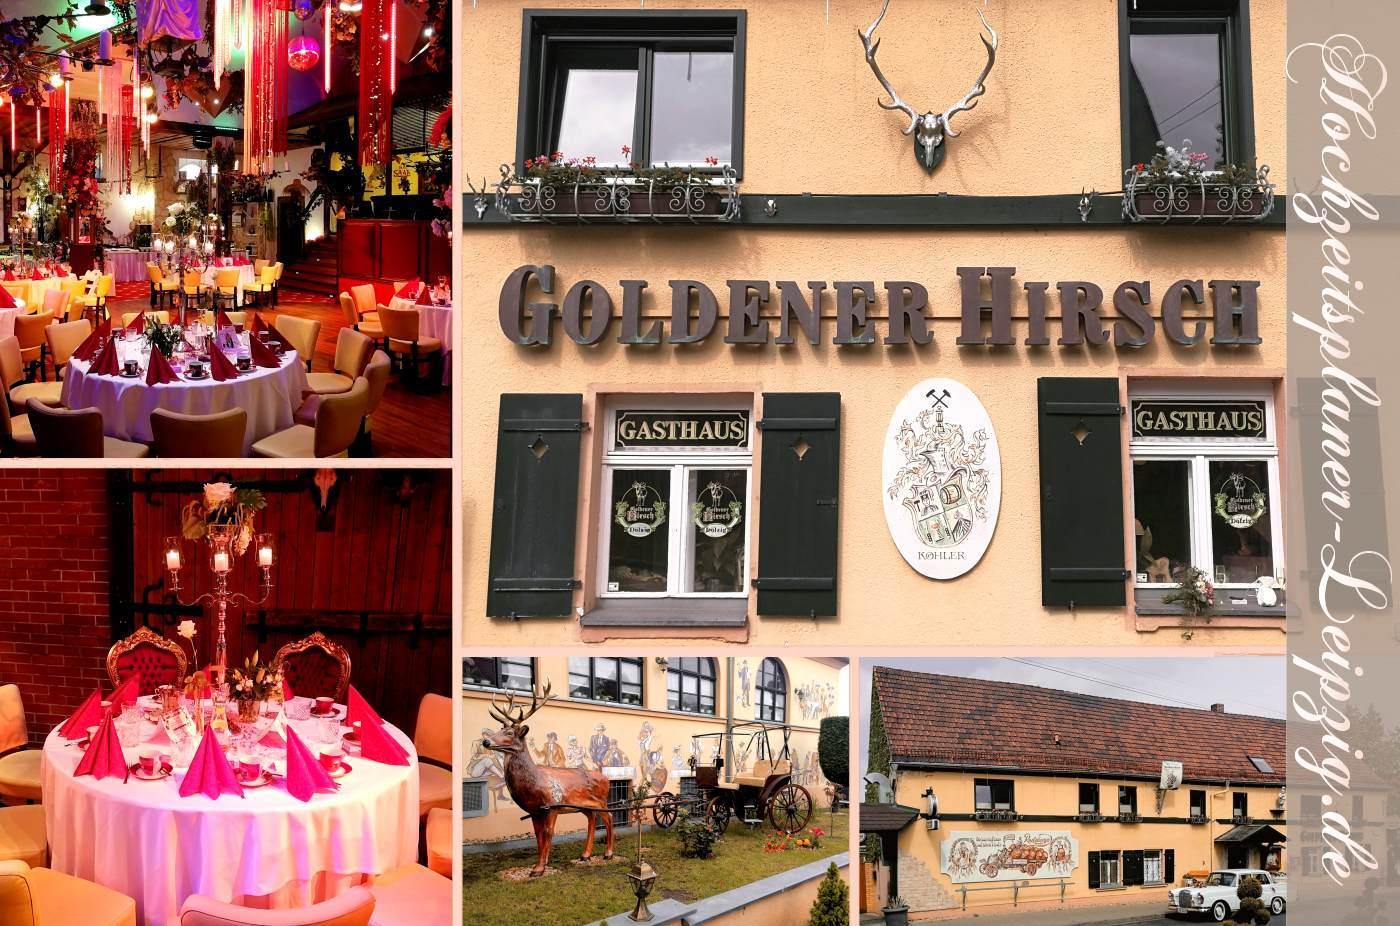 Dölzig Goldener Hirsch